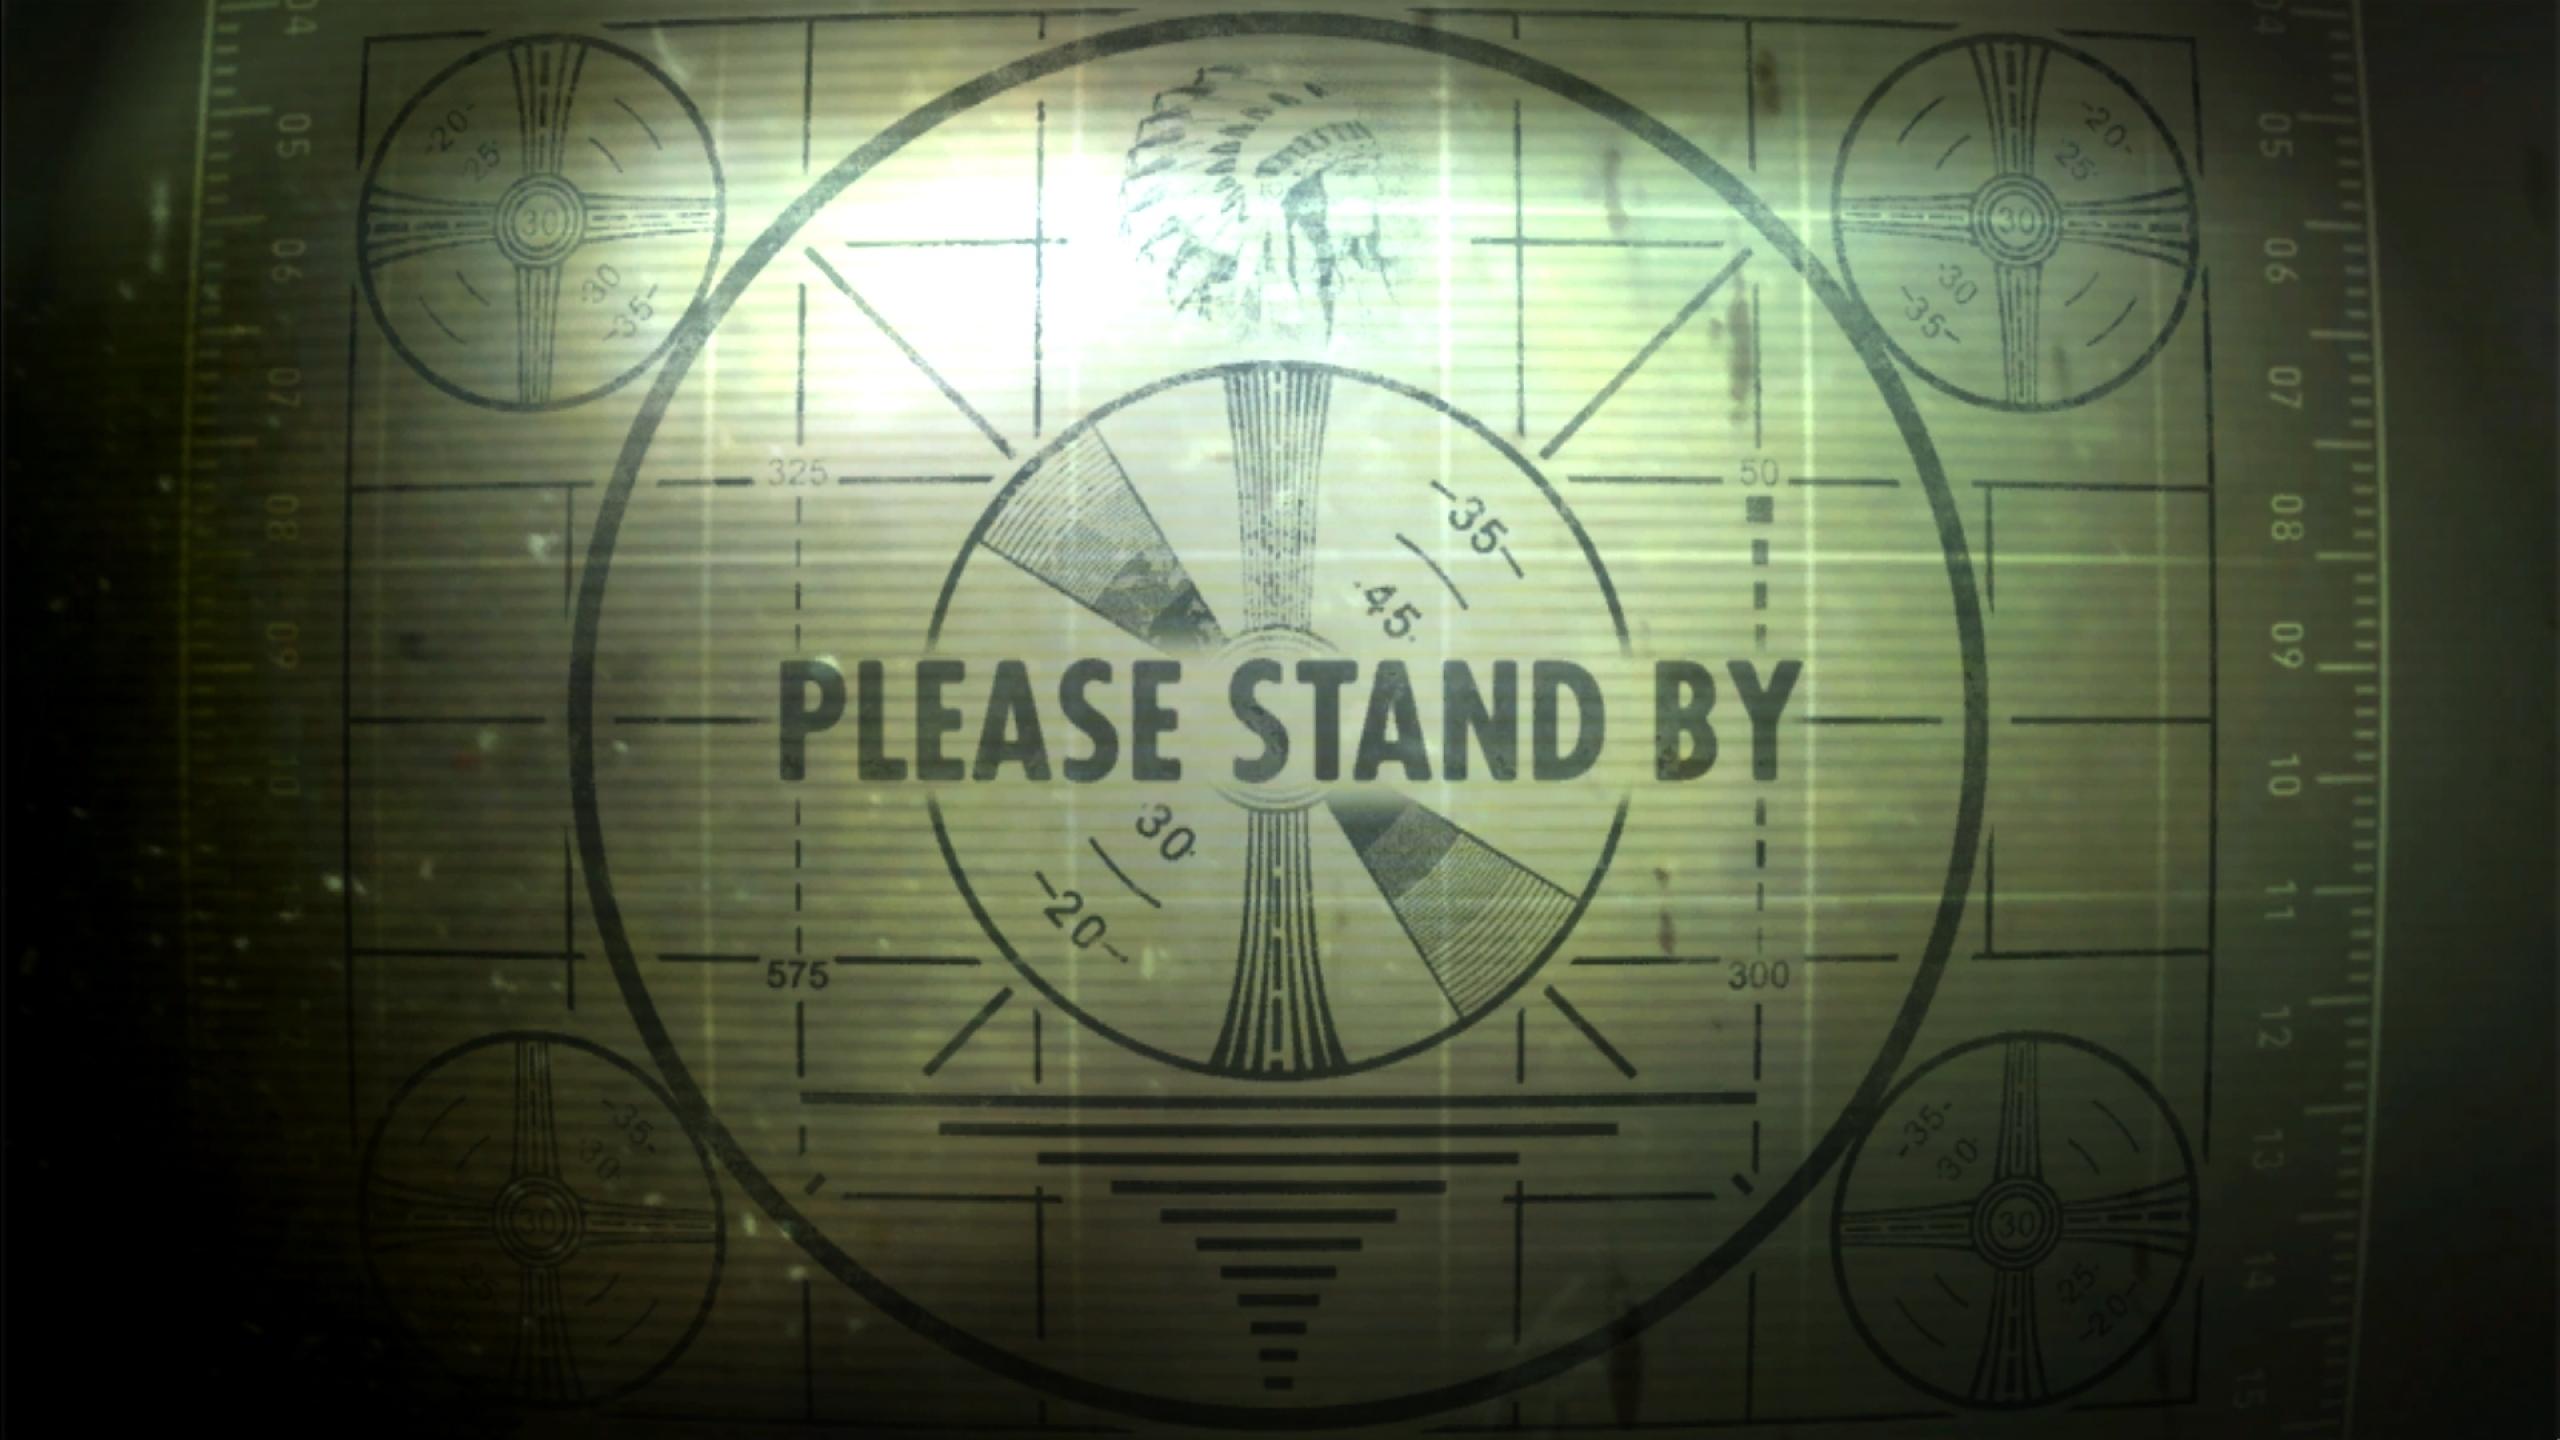 video games fallout classic fallout 3 test pattern 1920x1080 wallpaper 2560x1440